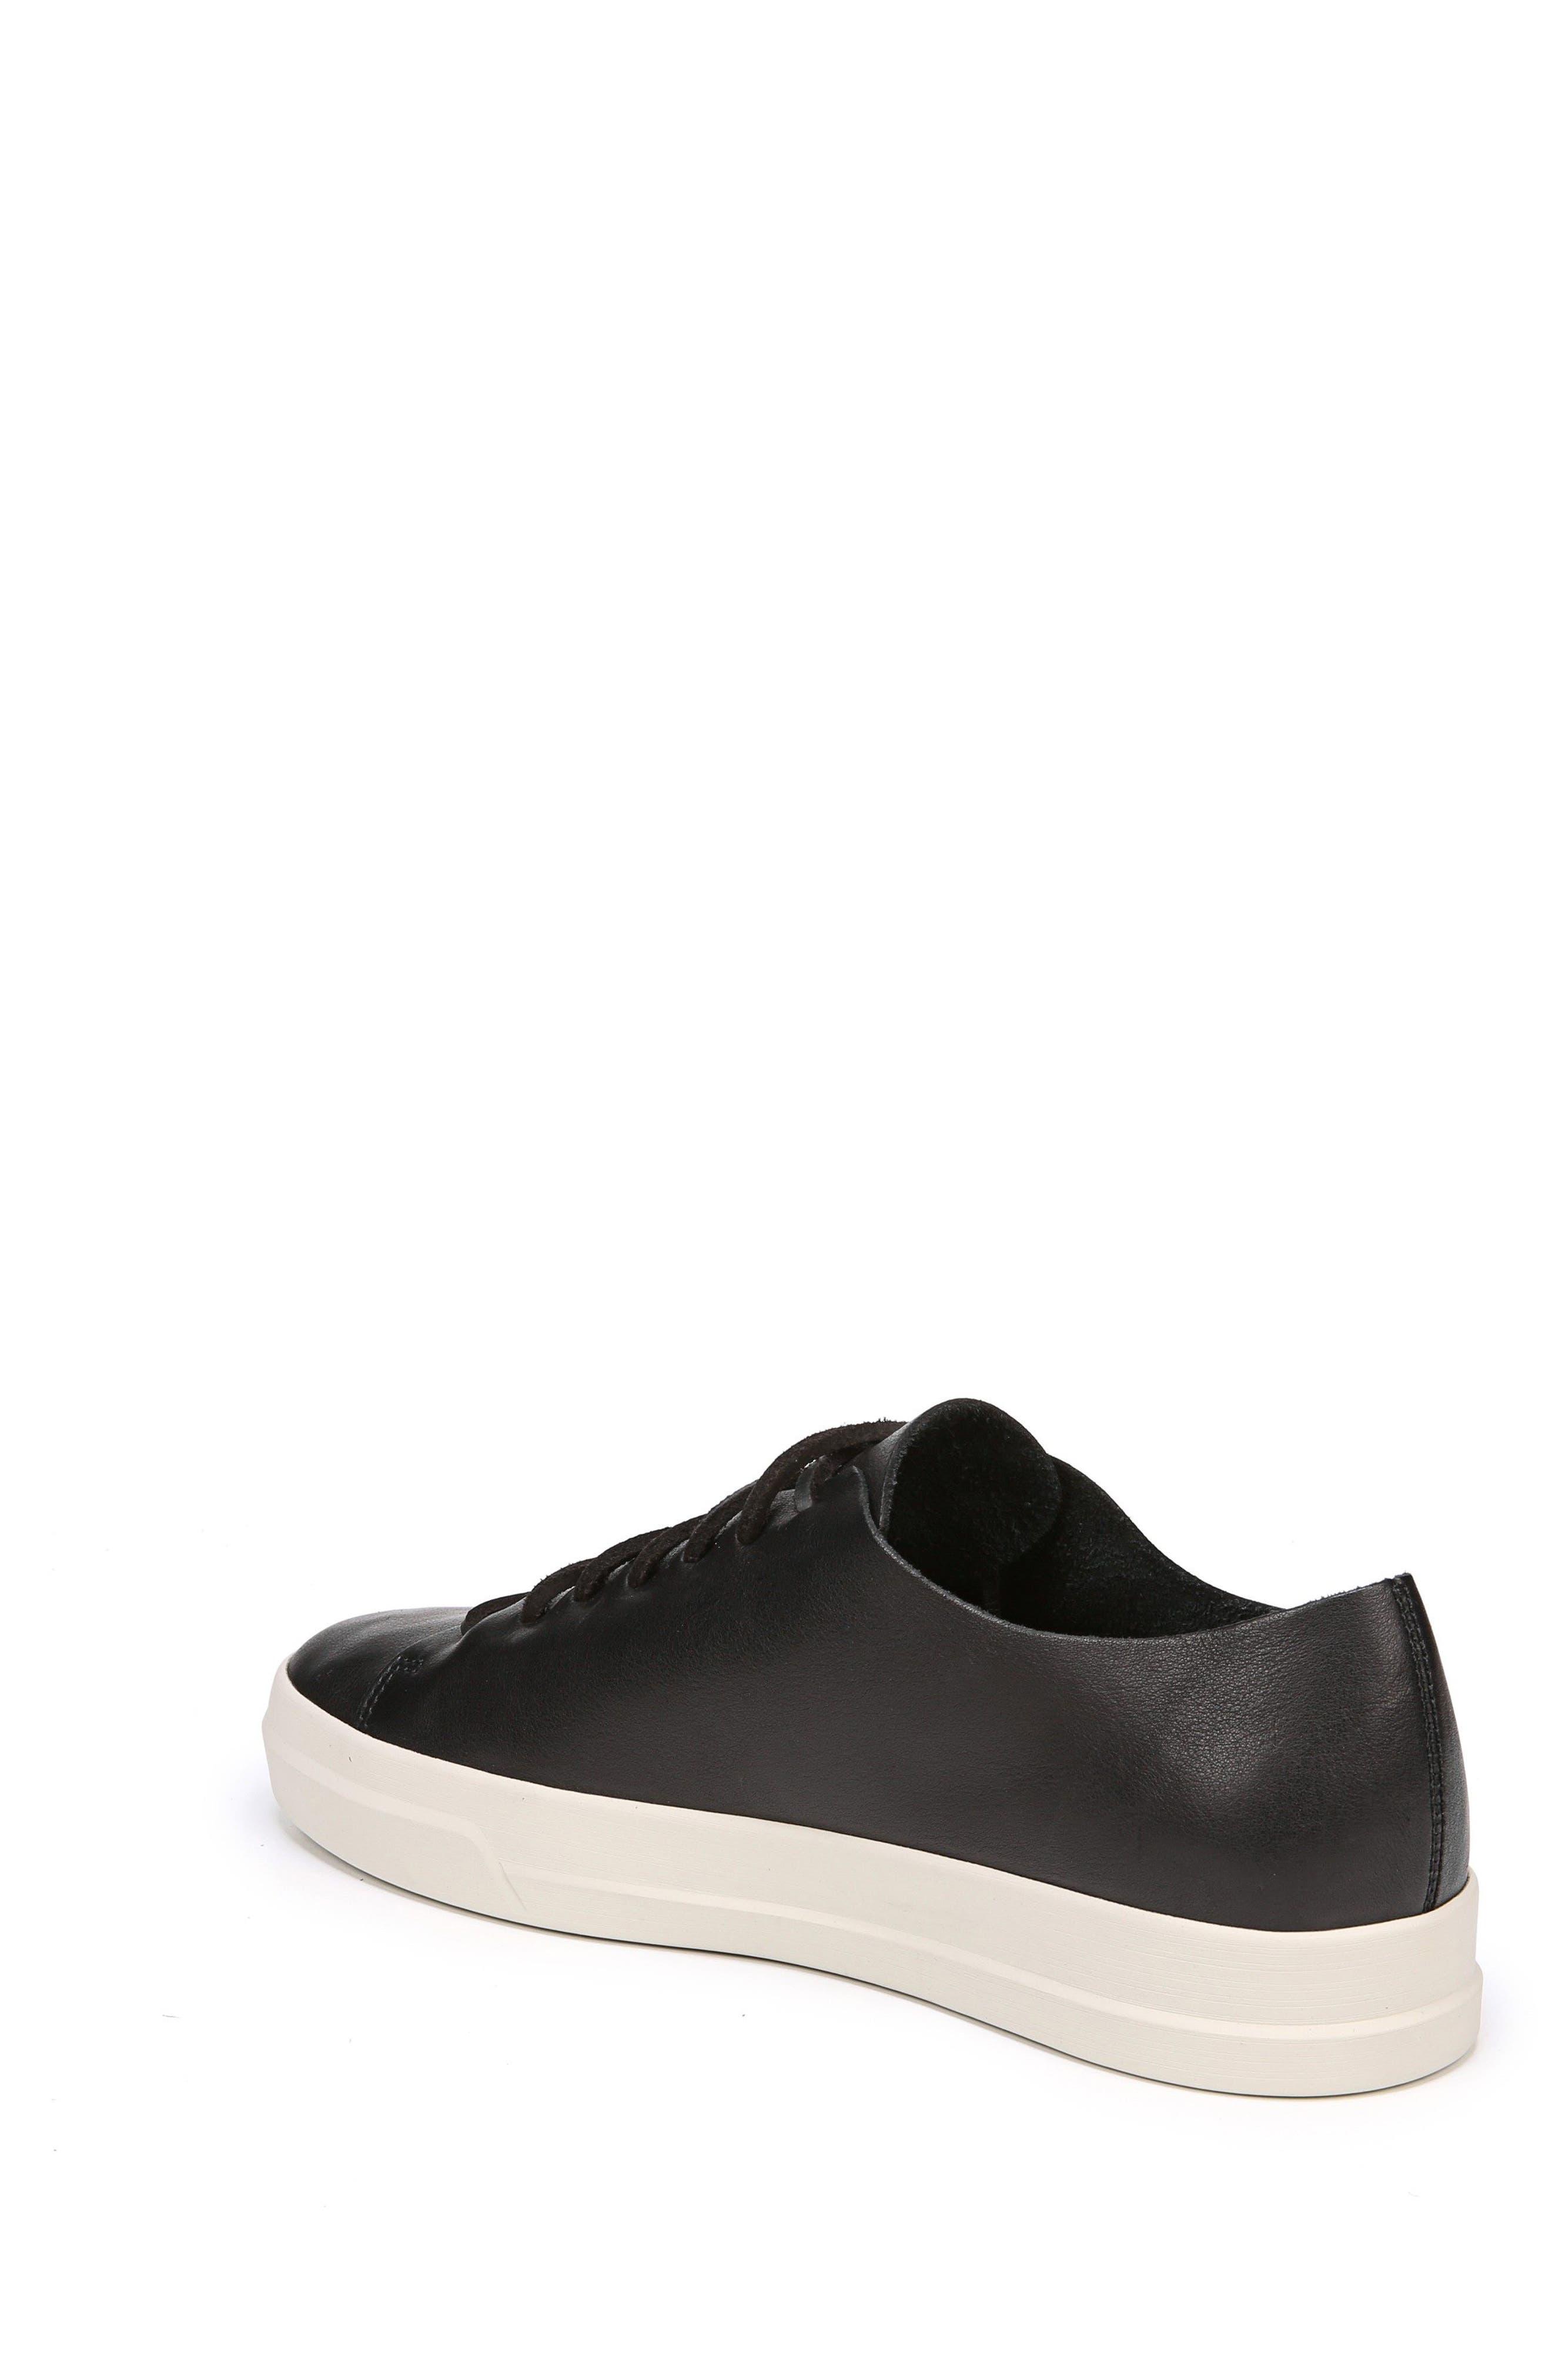 Copeland Sneaker,                             Alternate thumbnail 2, color,                             Black